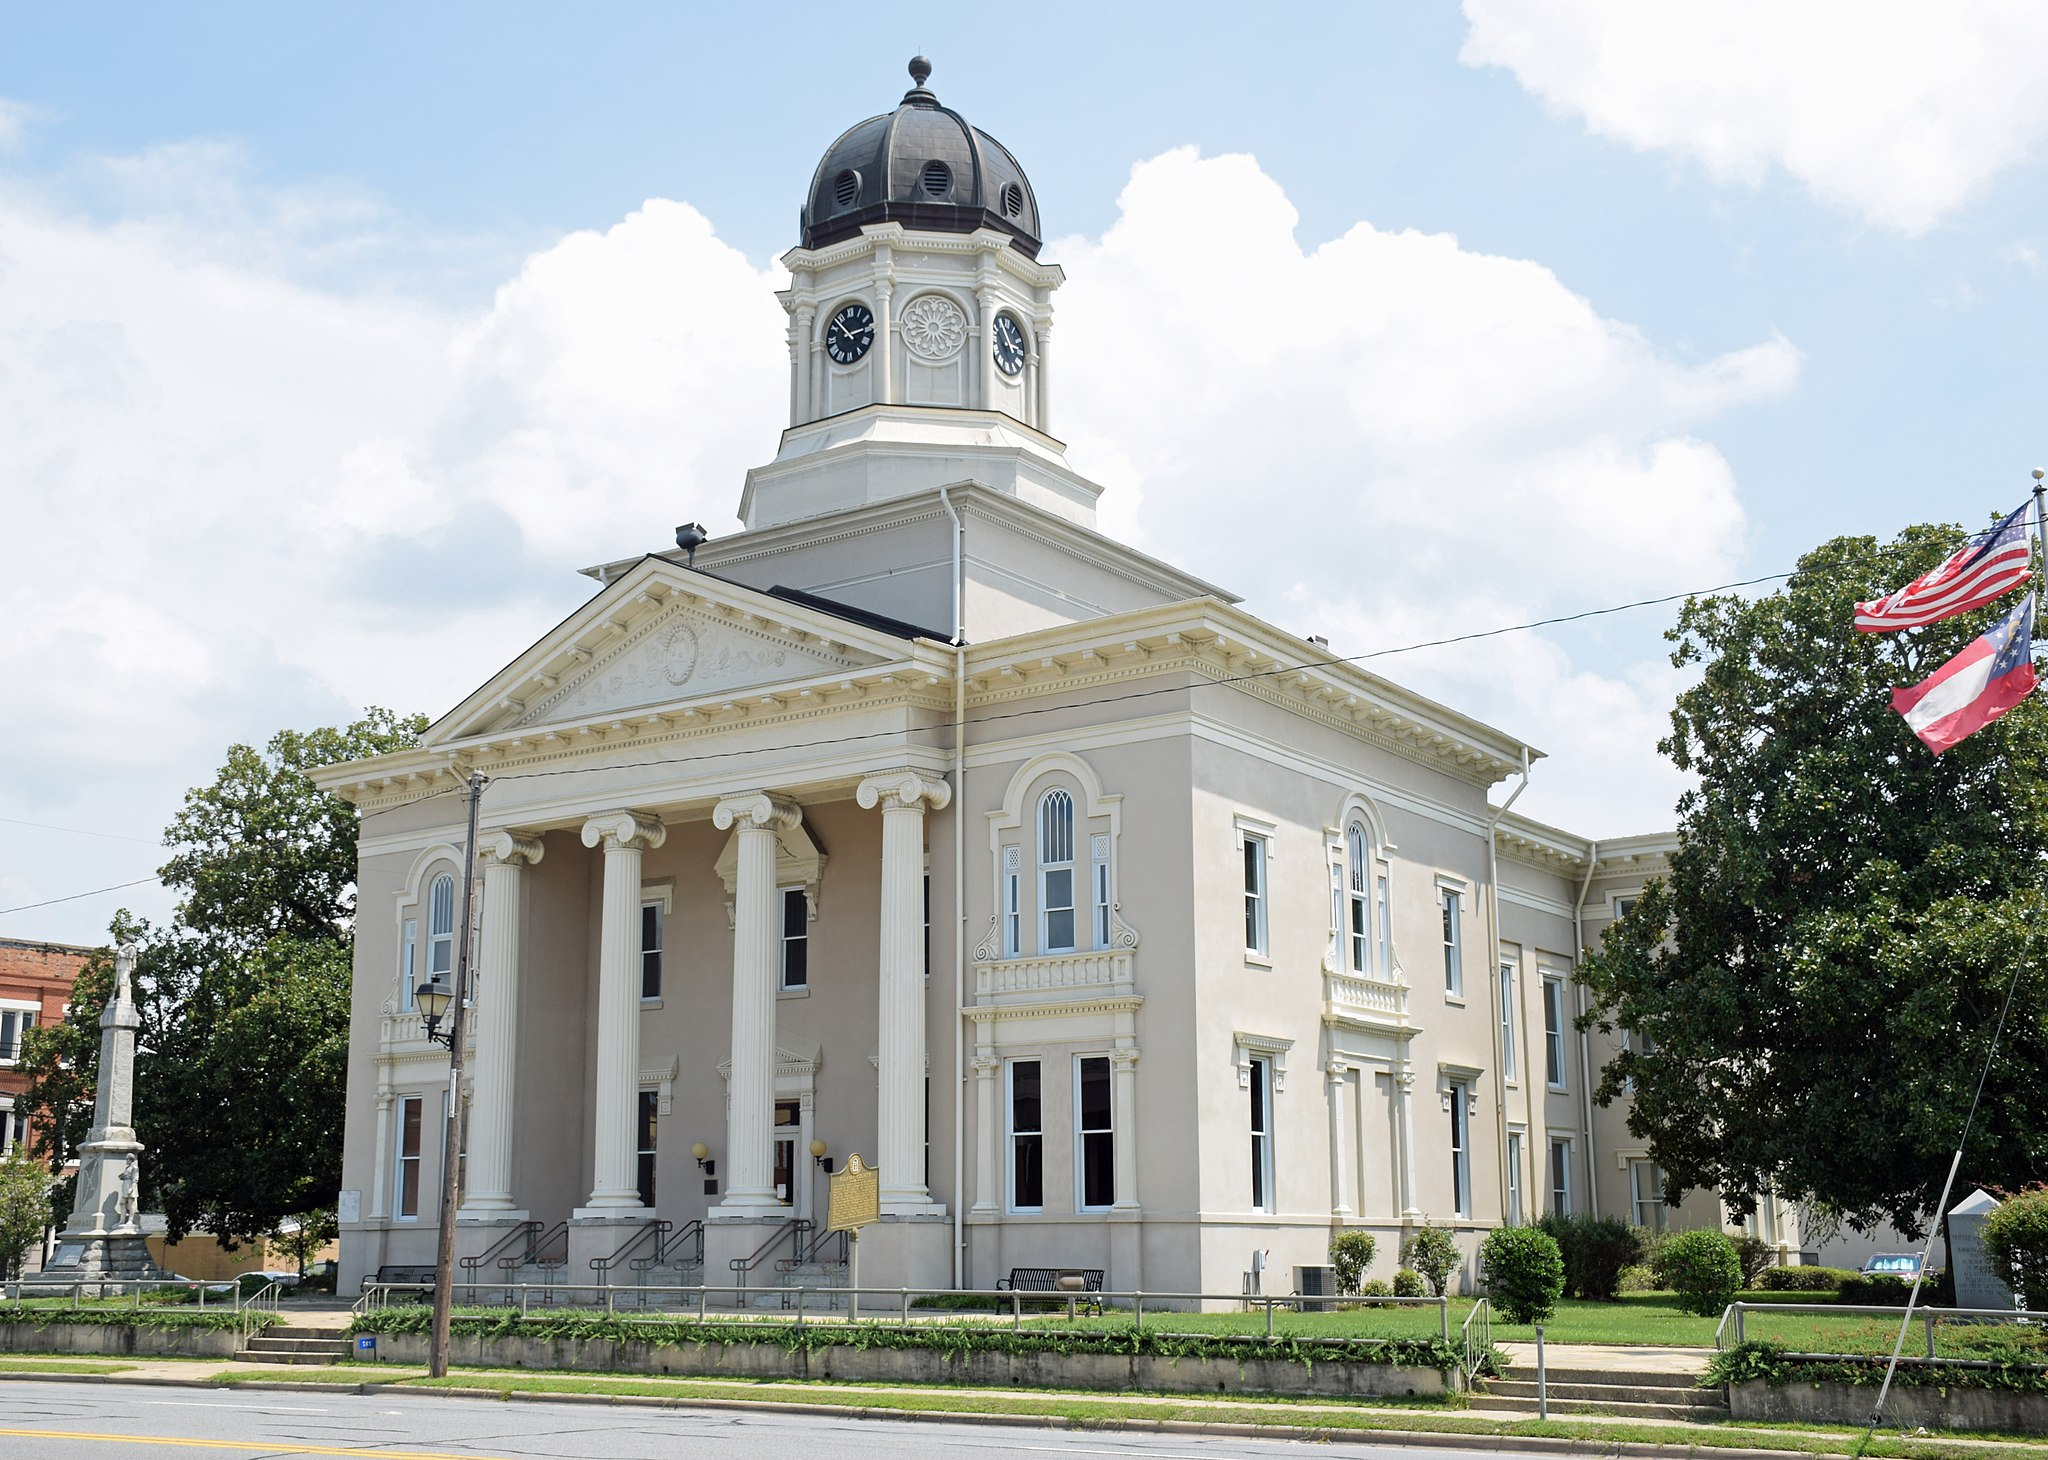 Pulaski County Courthouse, Hawkinsville, GA, US